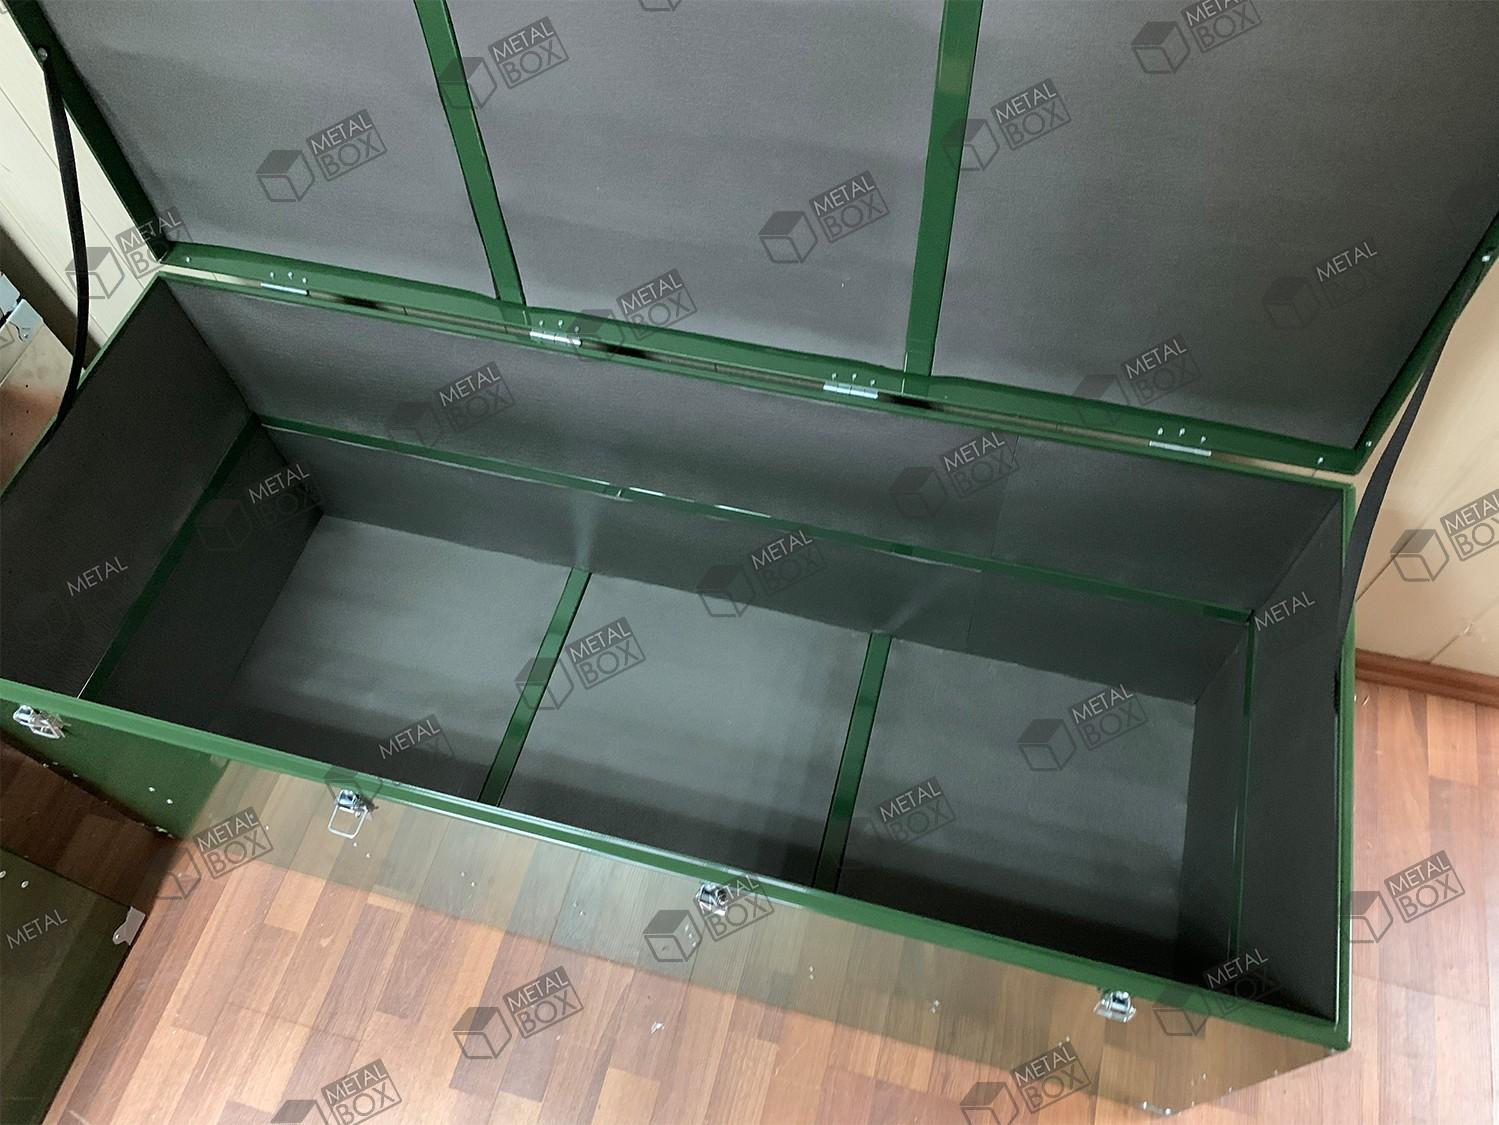 https://bv-case.ru/images/upload/ящики-алюминиевые-1370х520х570-мм-для-кинооборудования_28.JPG